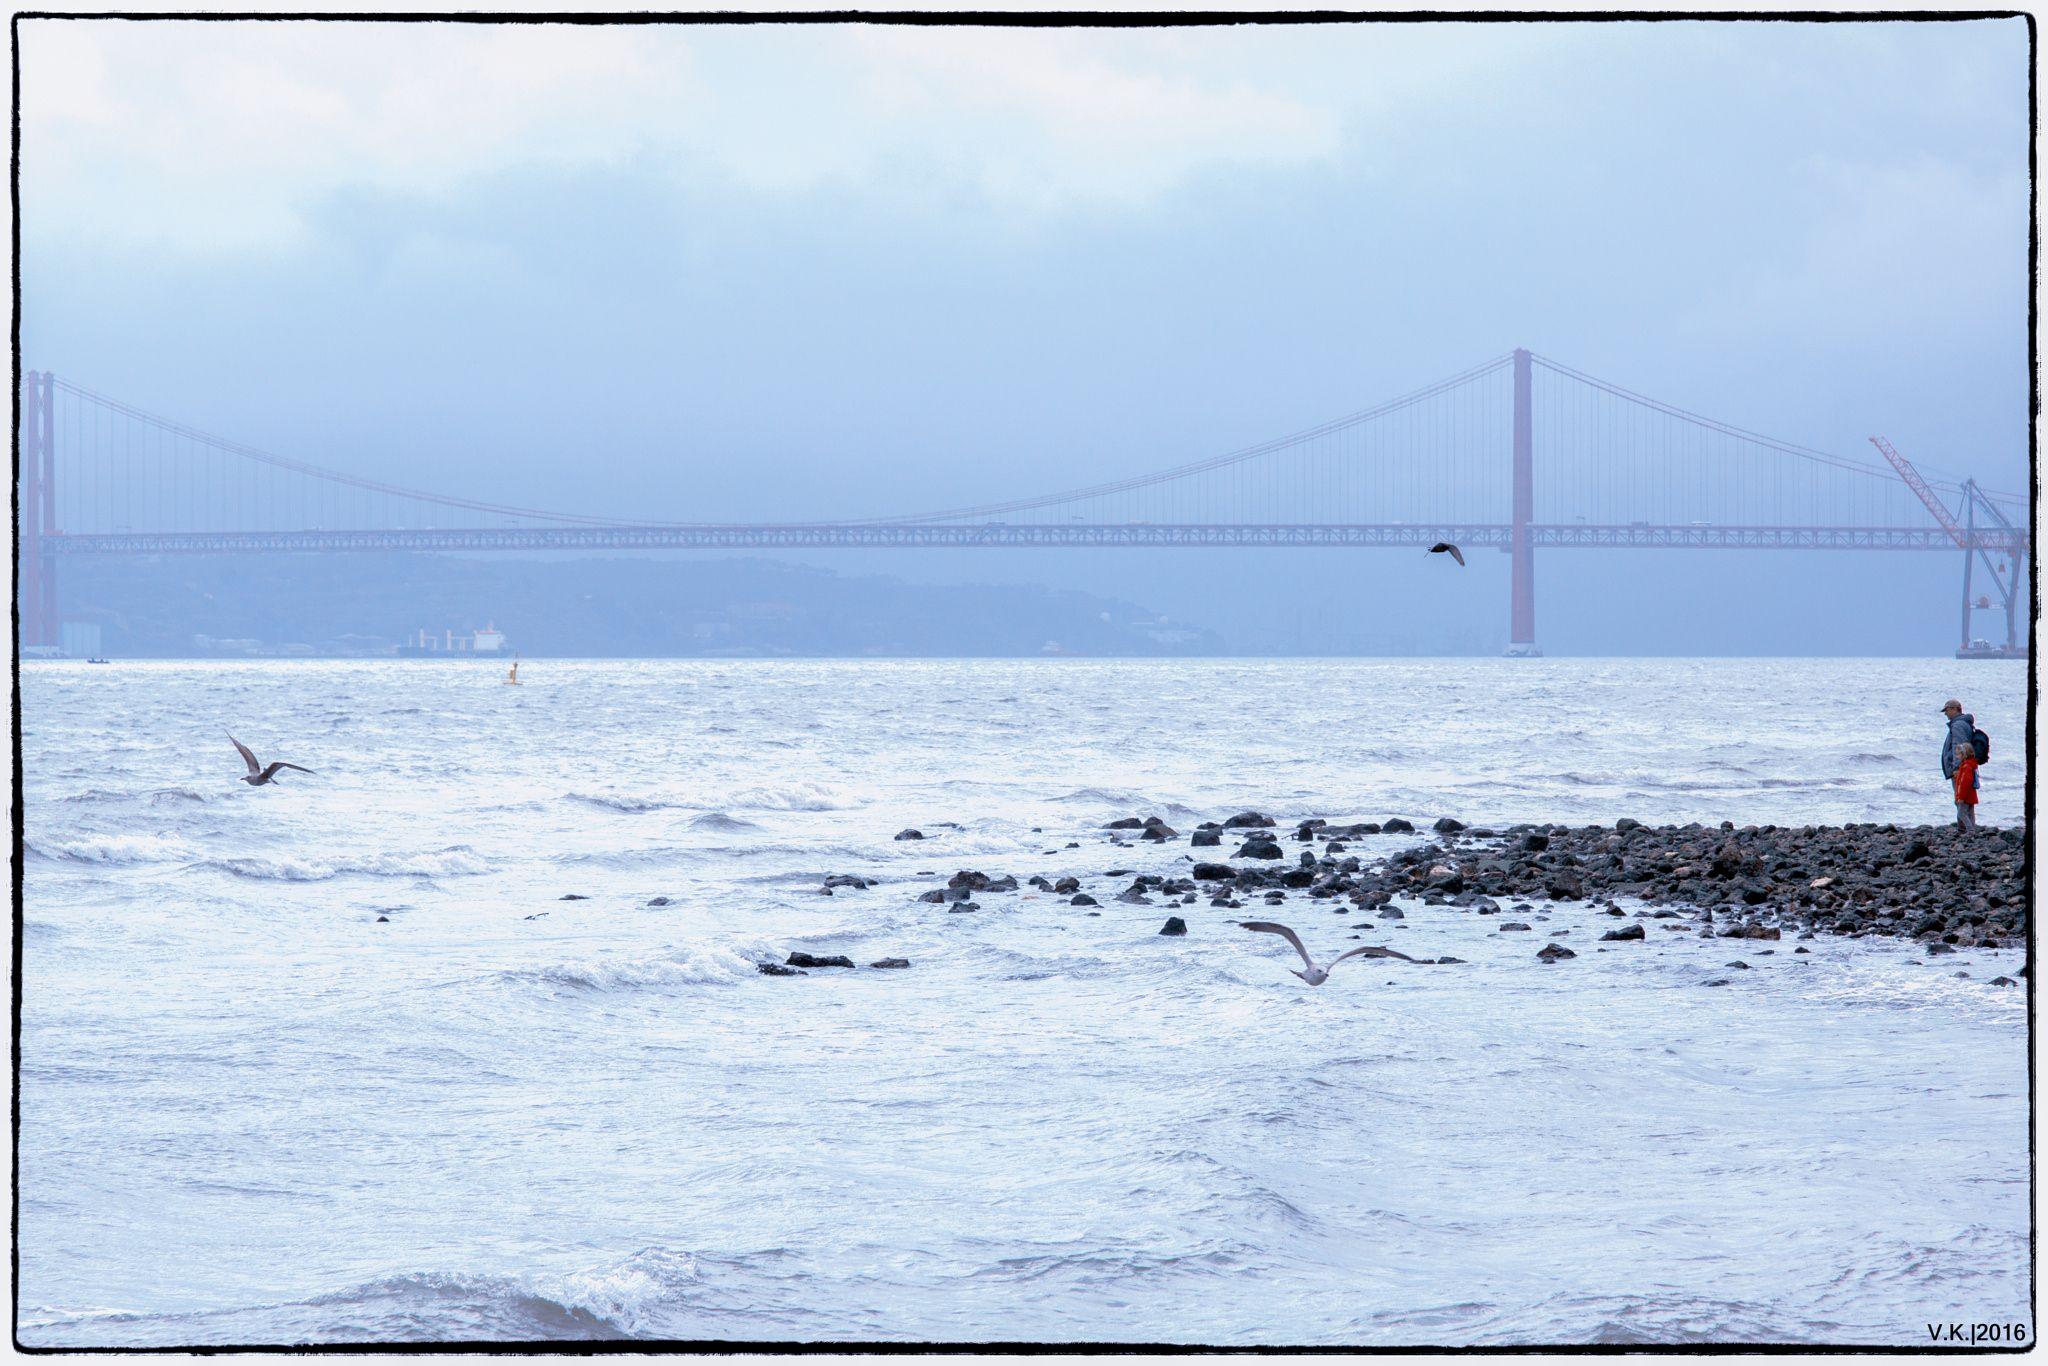 ocean view - Lisbon, Portugal April 2016